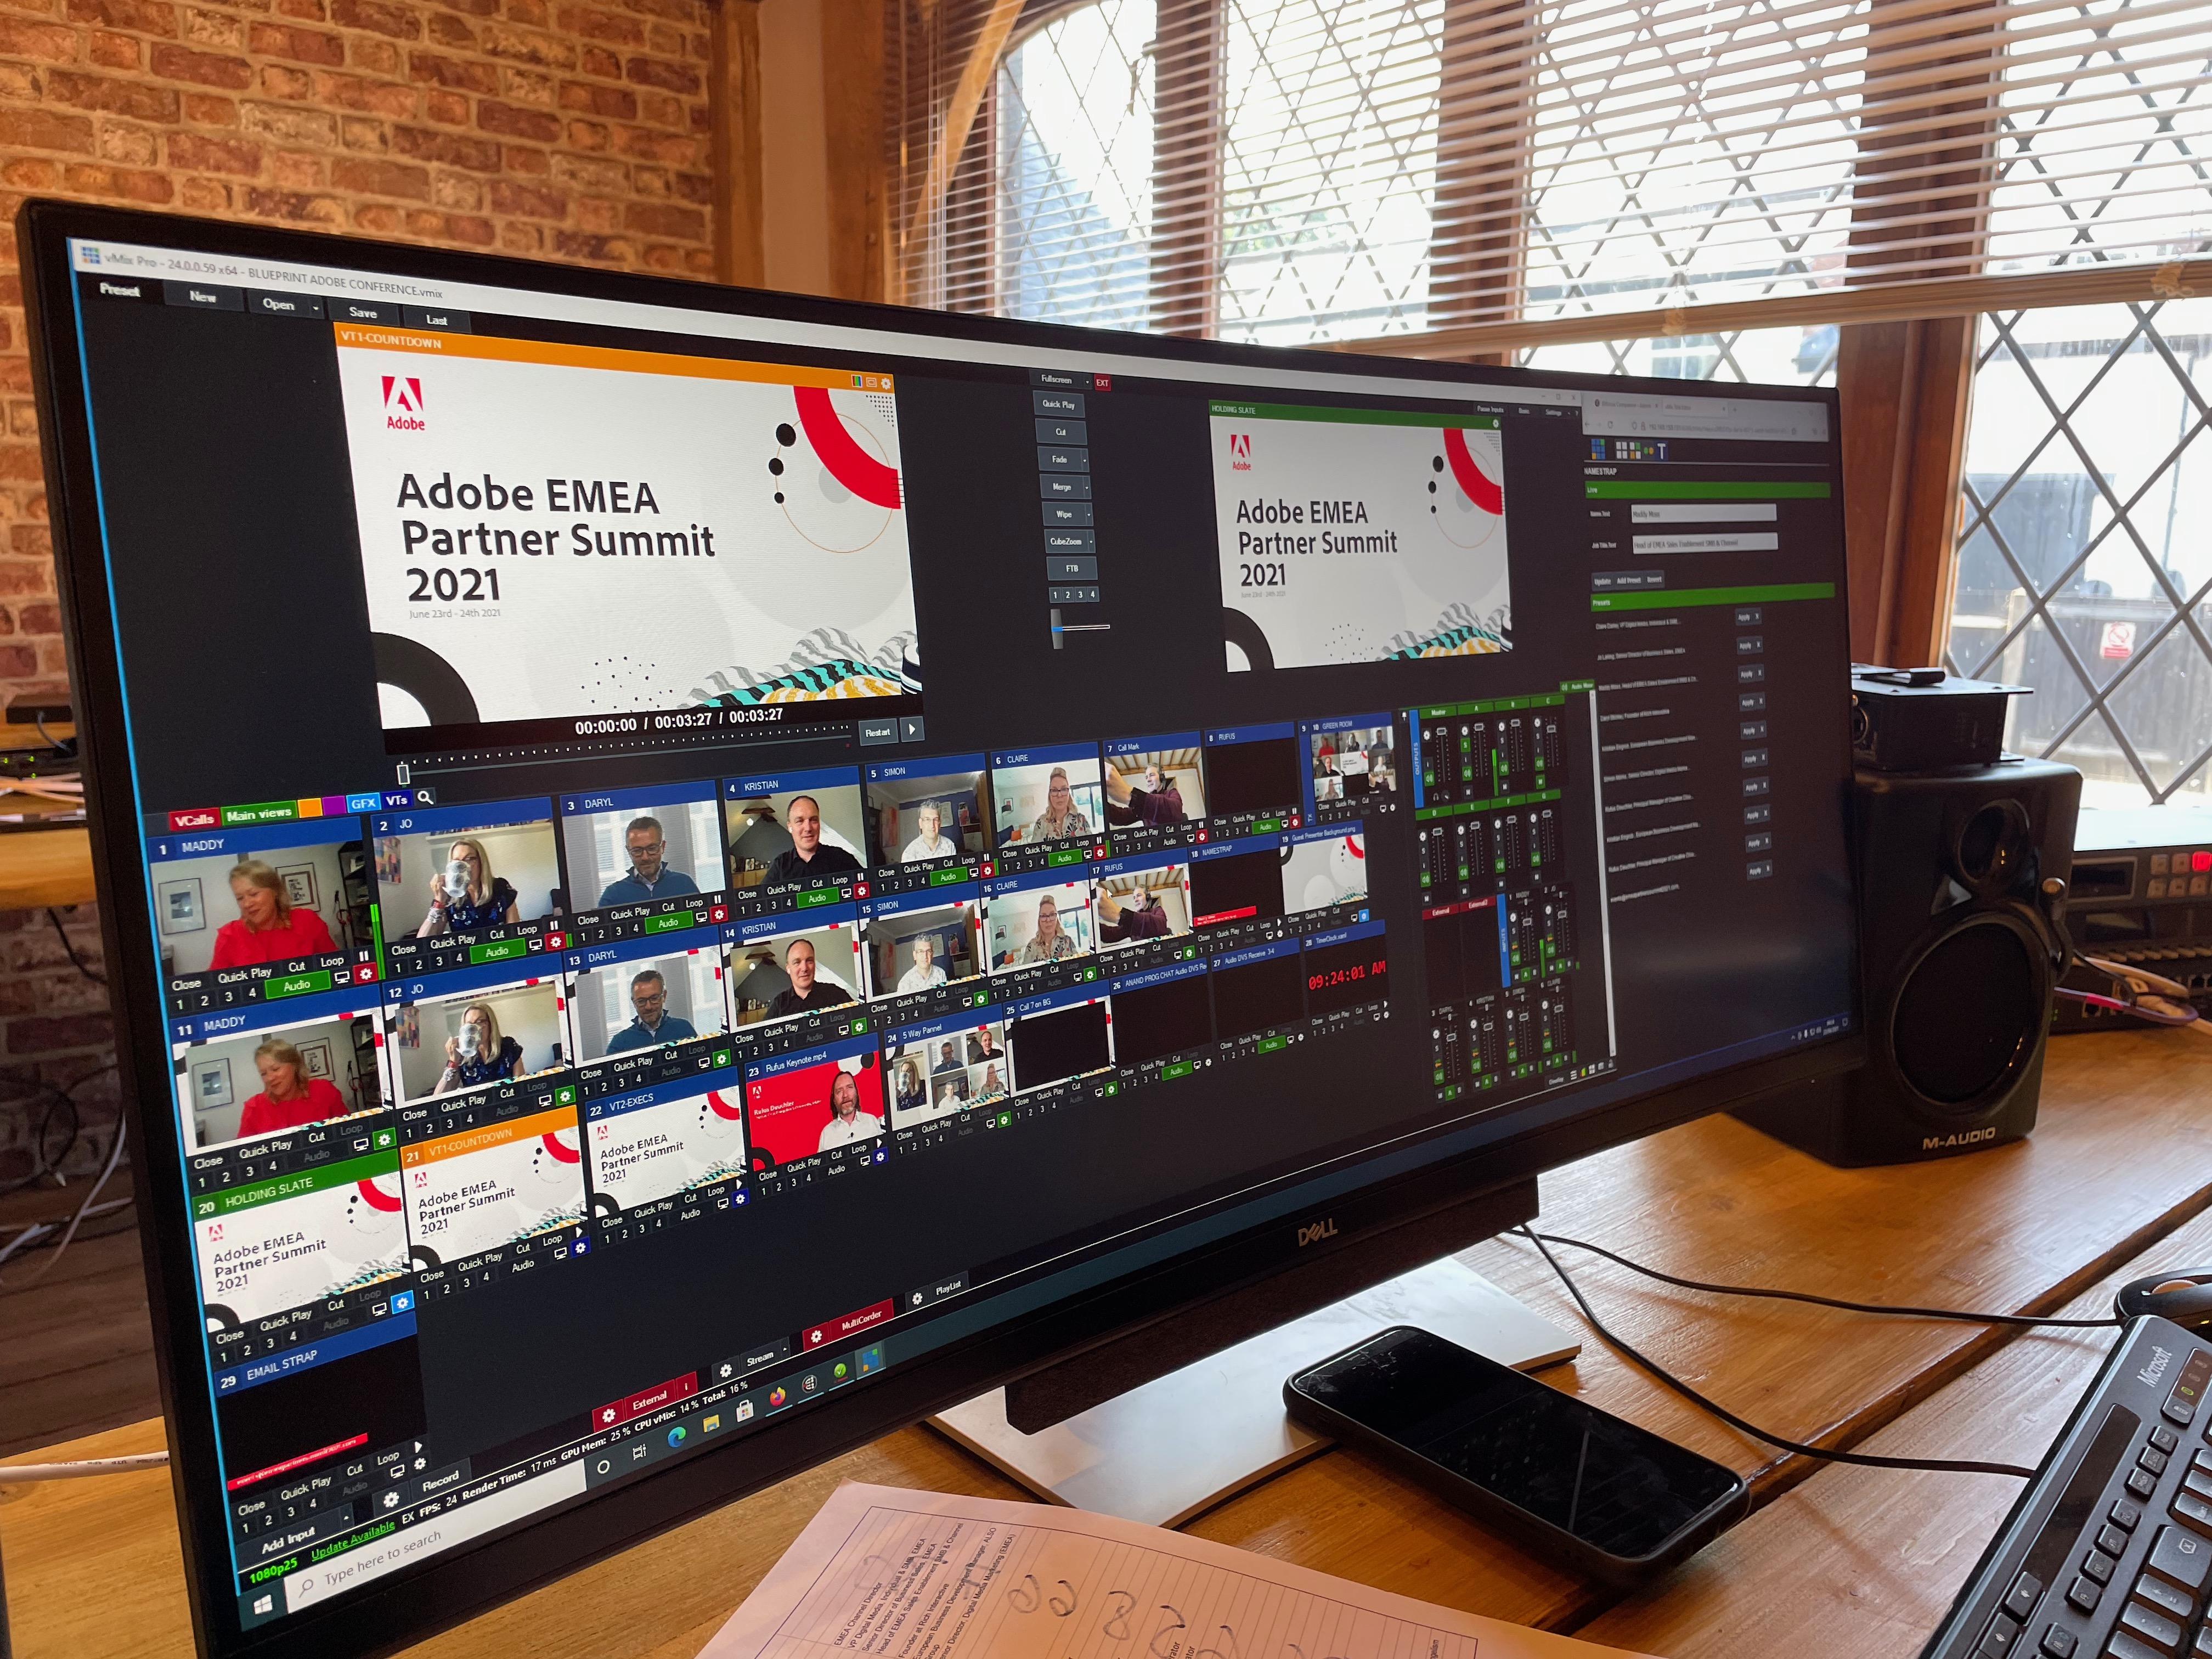 Adobe Partner Summit in action